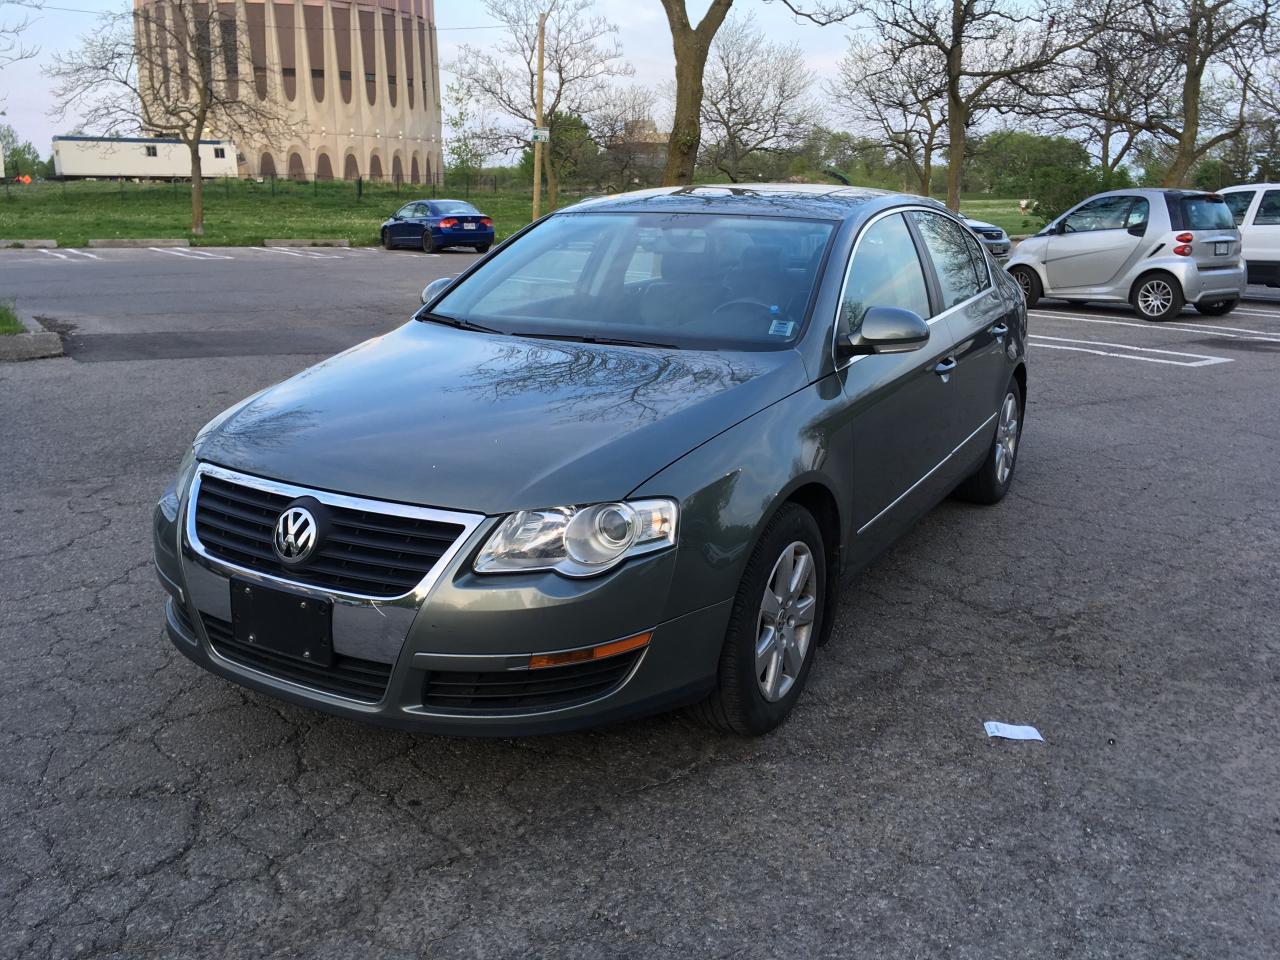 Used 2006 Volkswagen Passat 2.0T For Sale in Hamilton, ON - CarGurus